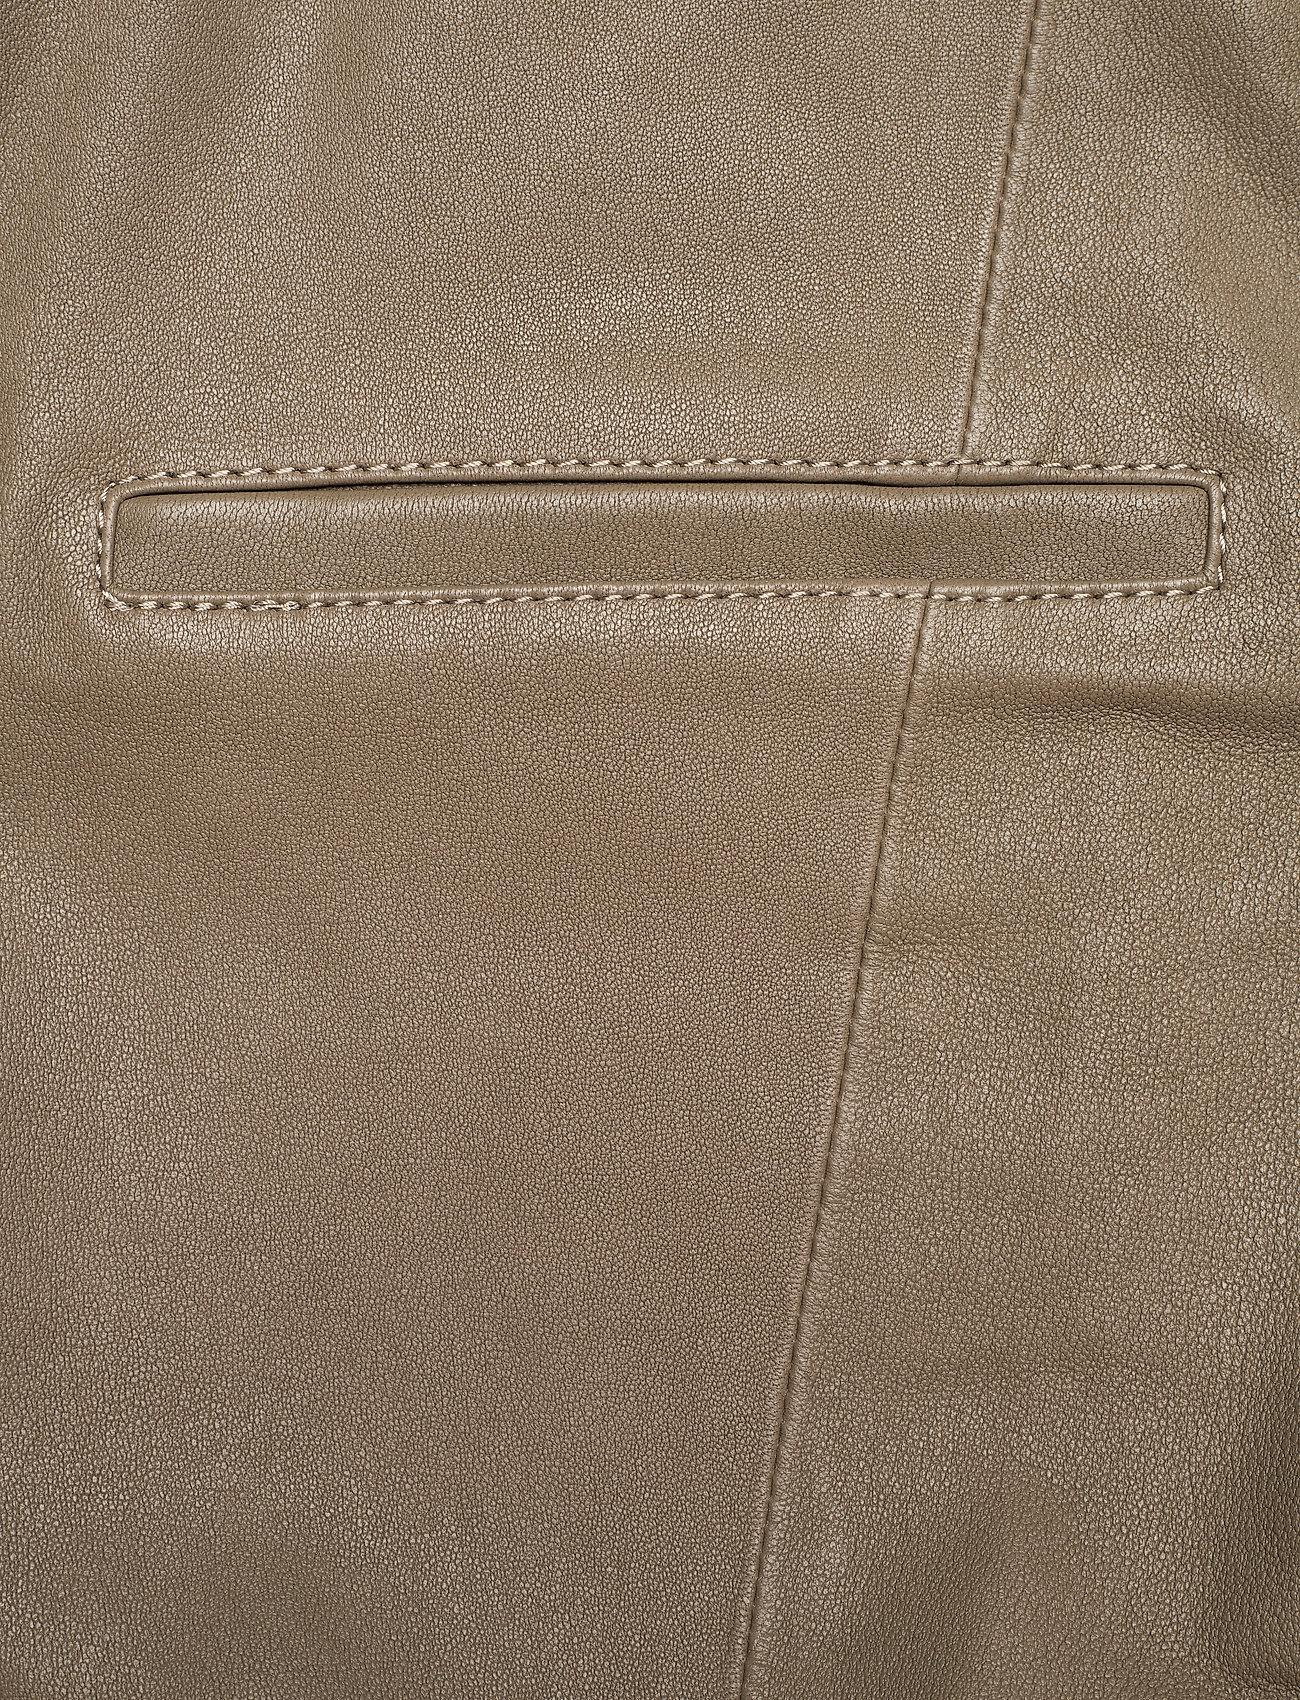 REMAIN Birger Christensen - Floral Pant Leather - læderbukser - simply taupe - 2